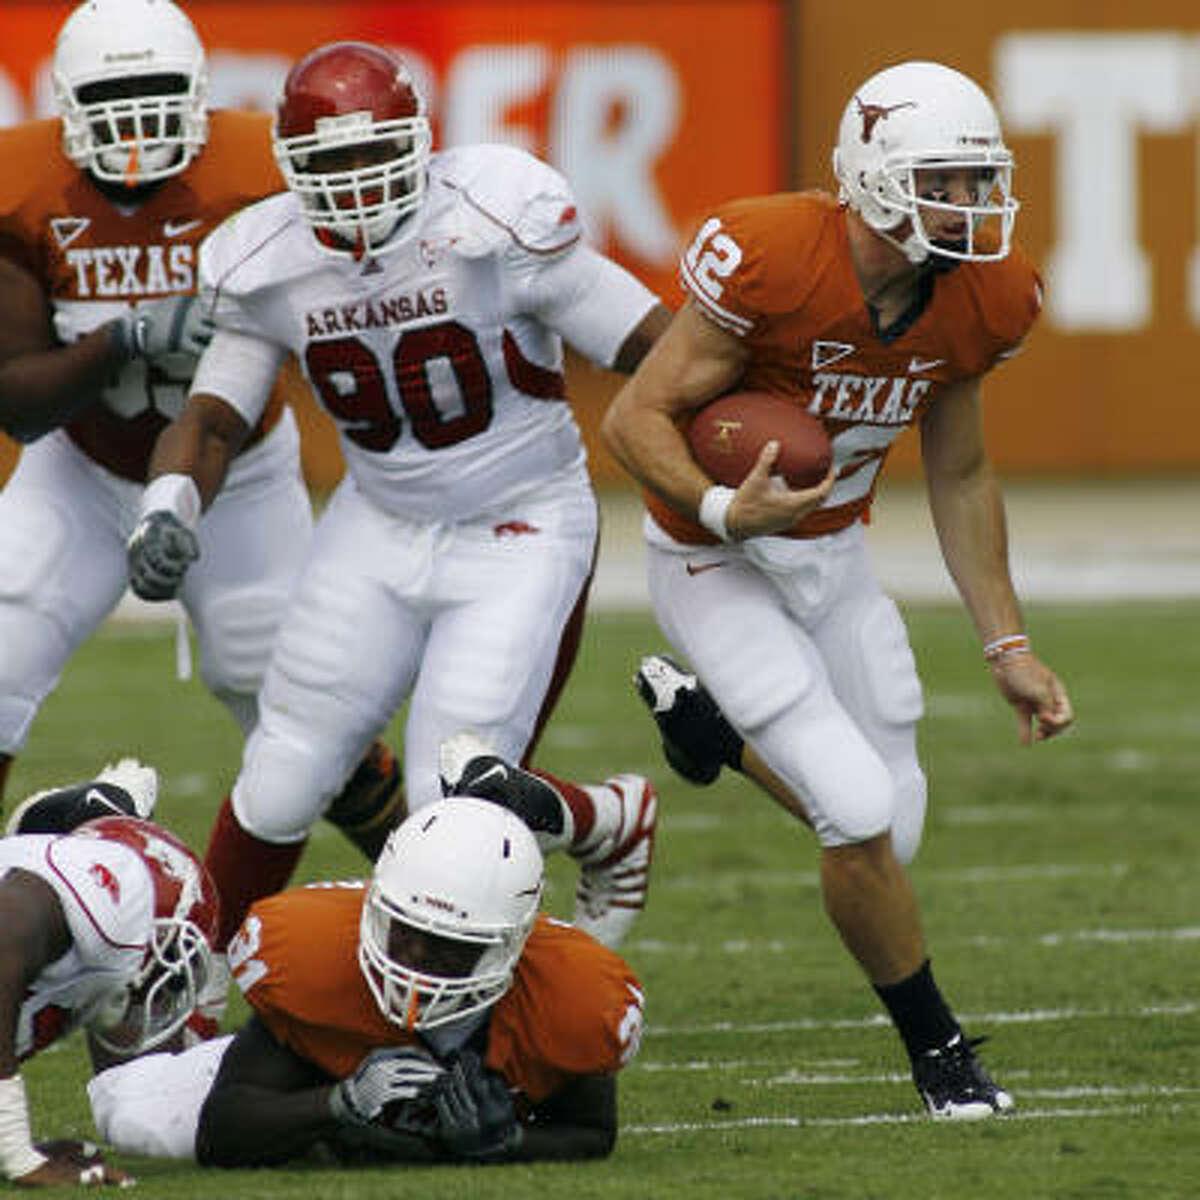 Texas' leading rusher so far? Colt McCoy.